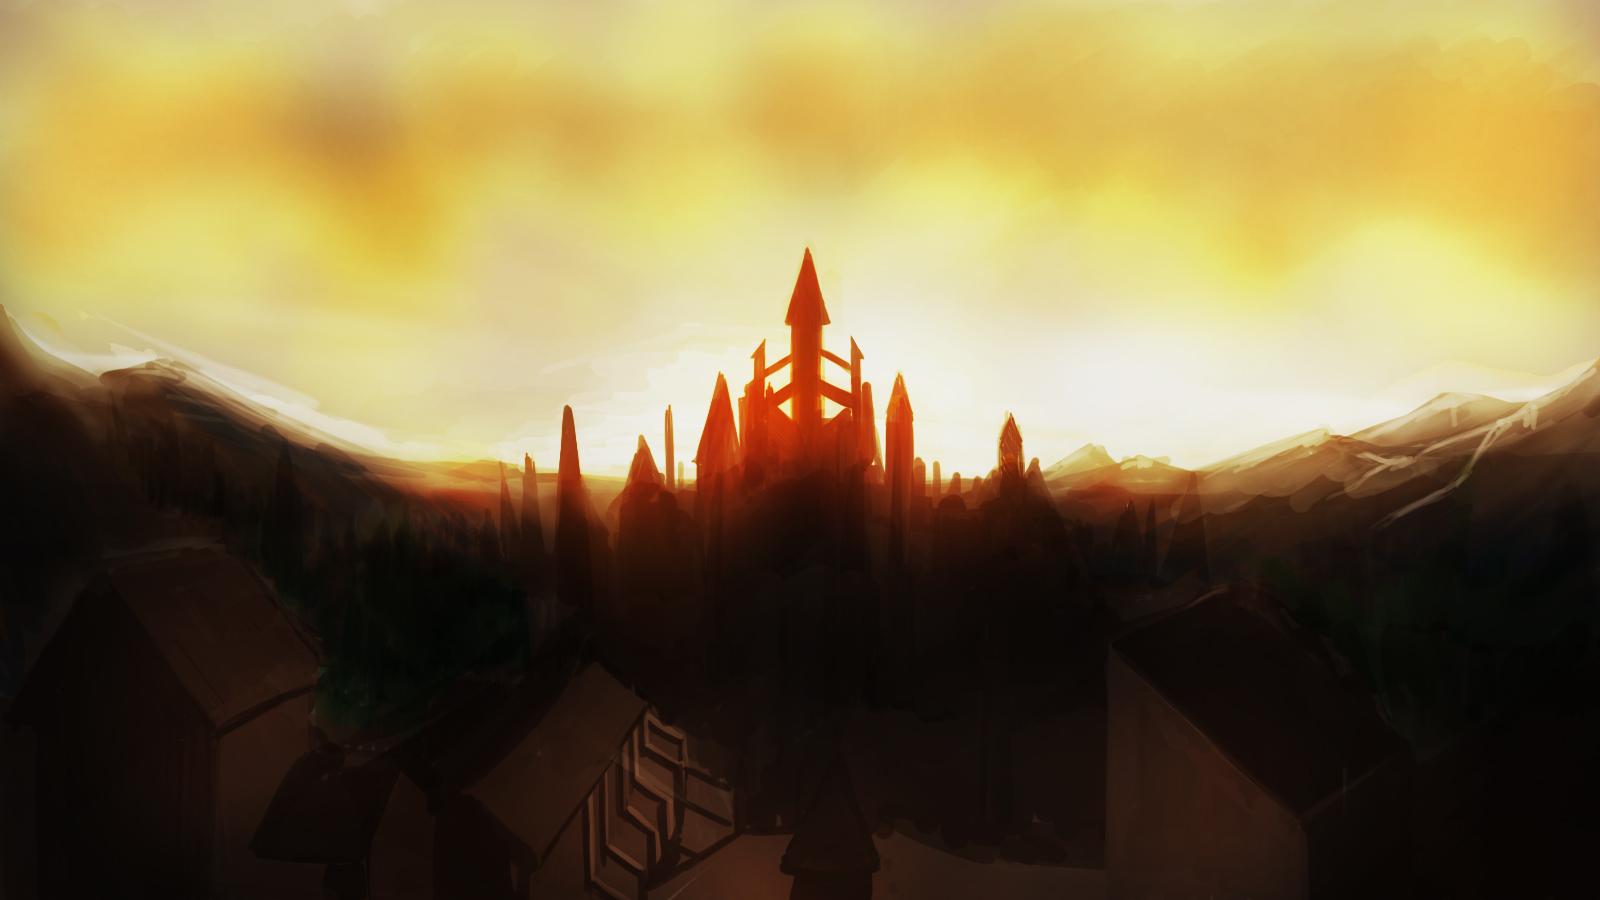 Anor Londo sunset